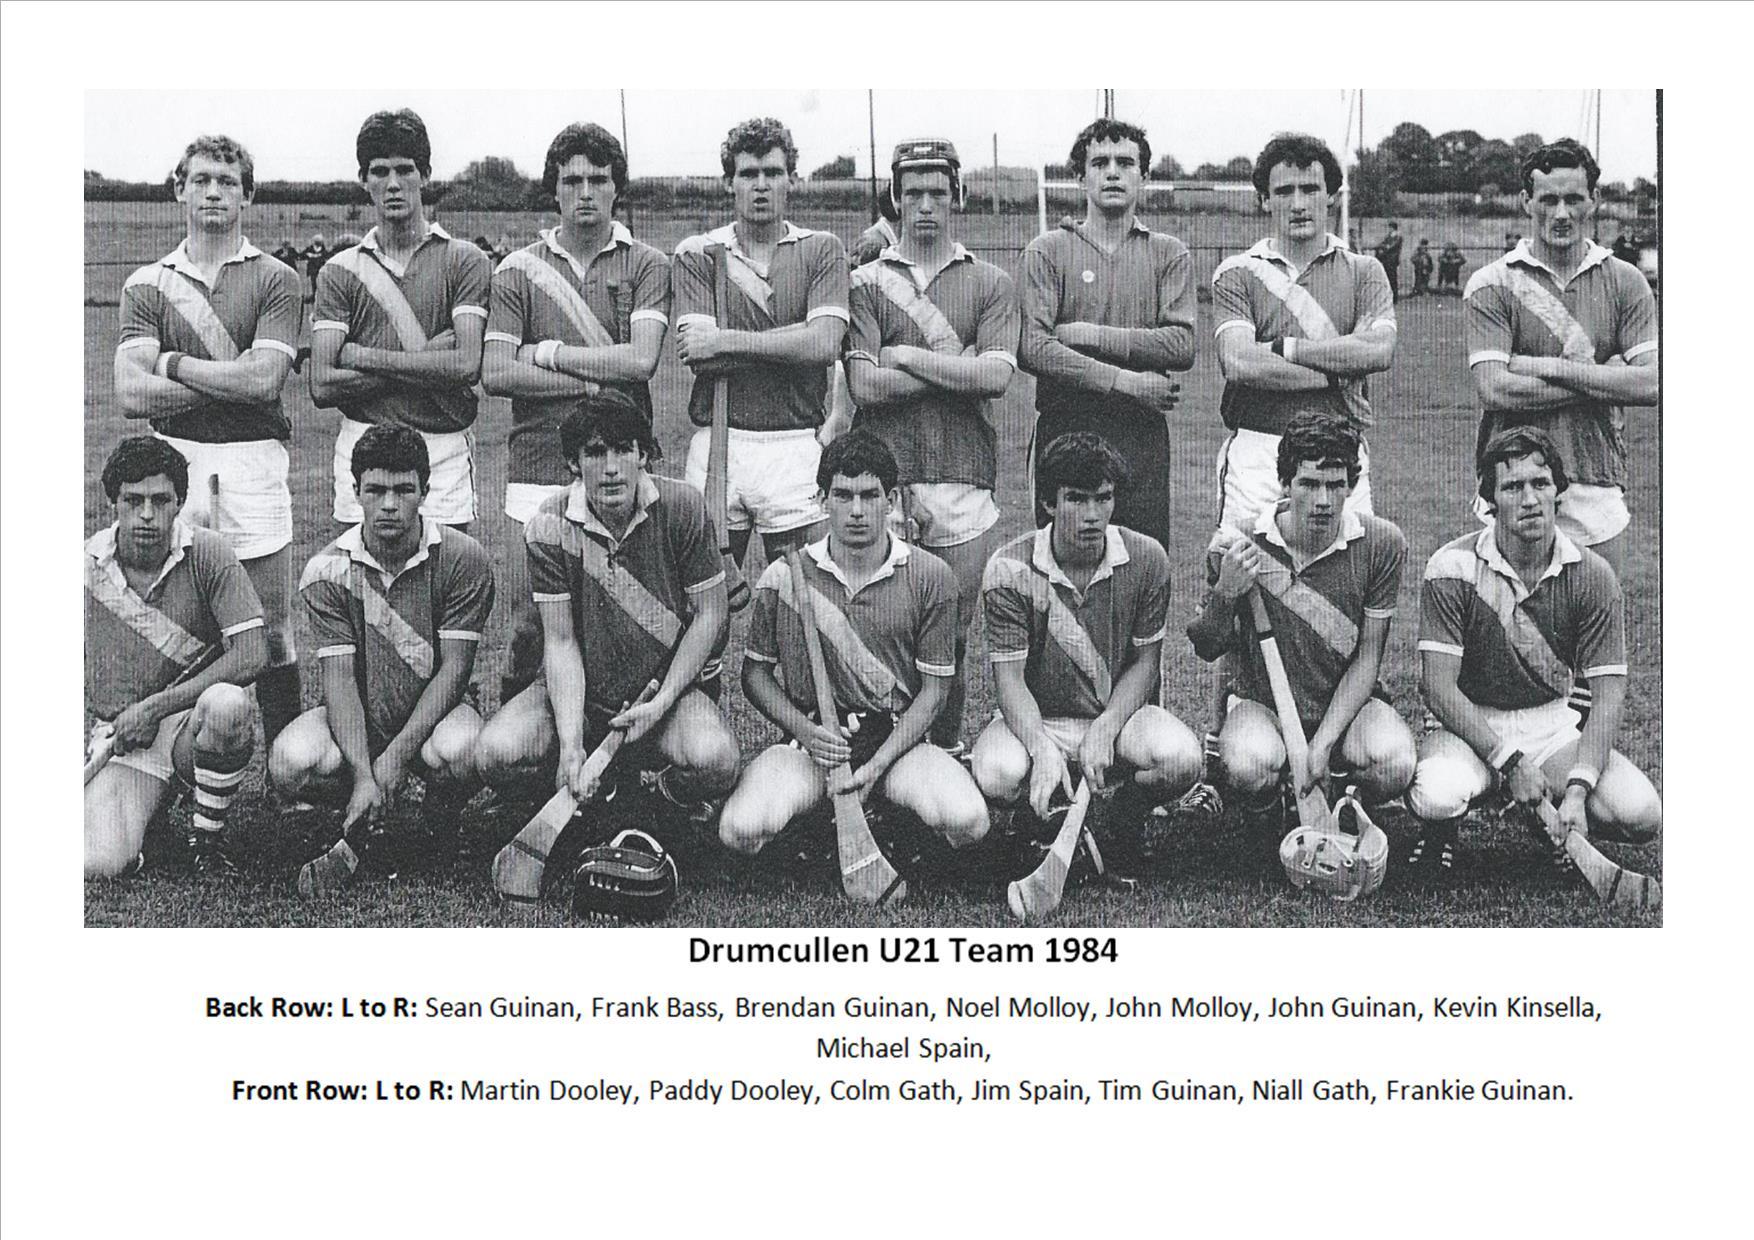 Drumcullen U21 Team 1984